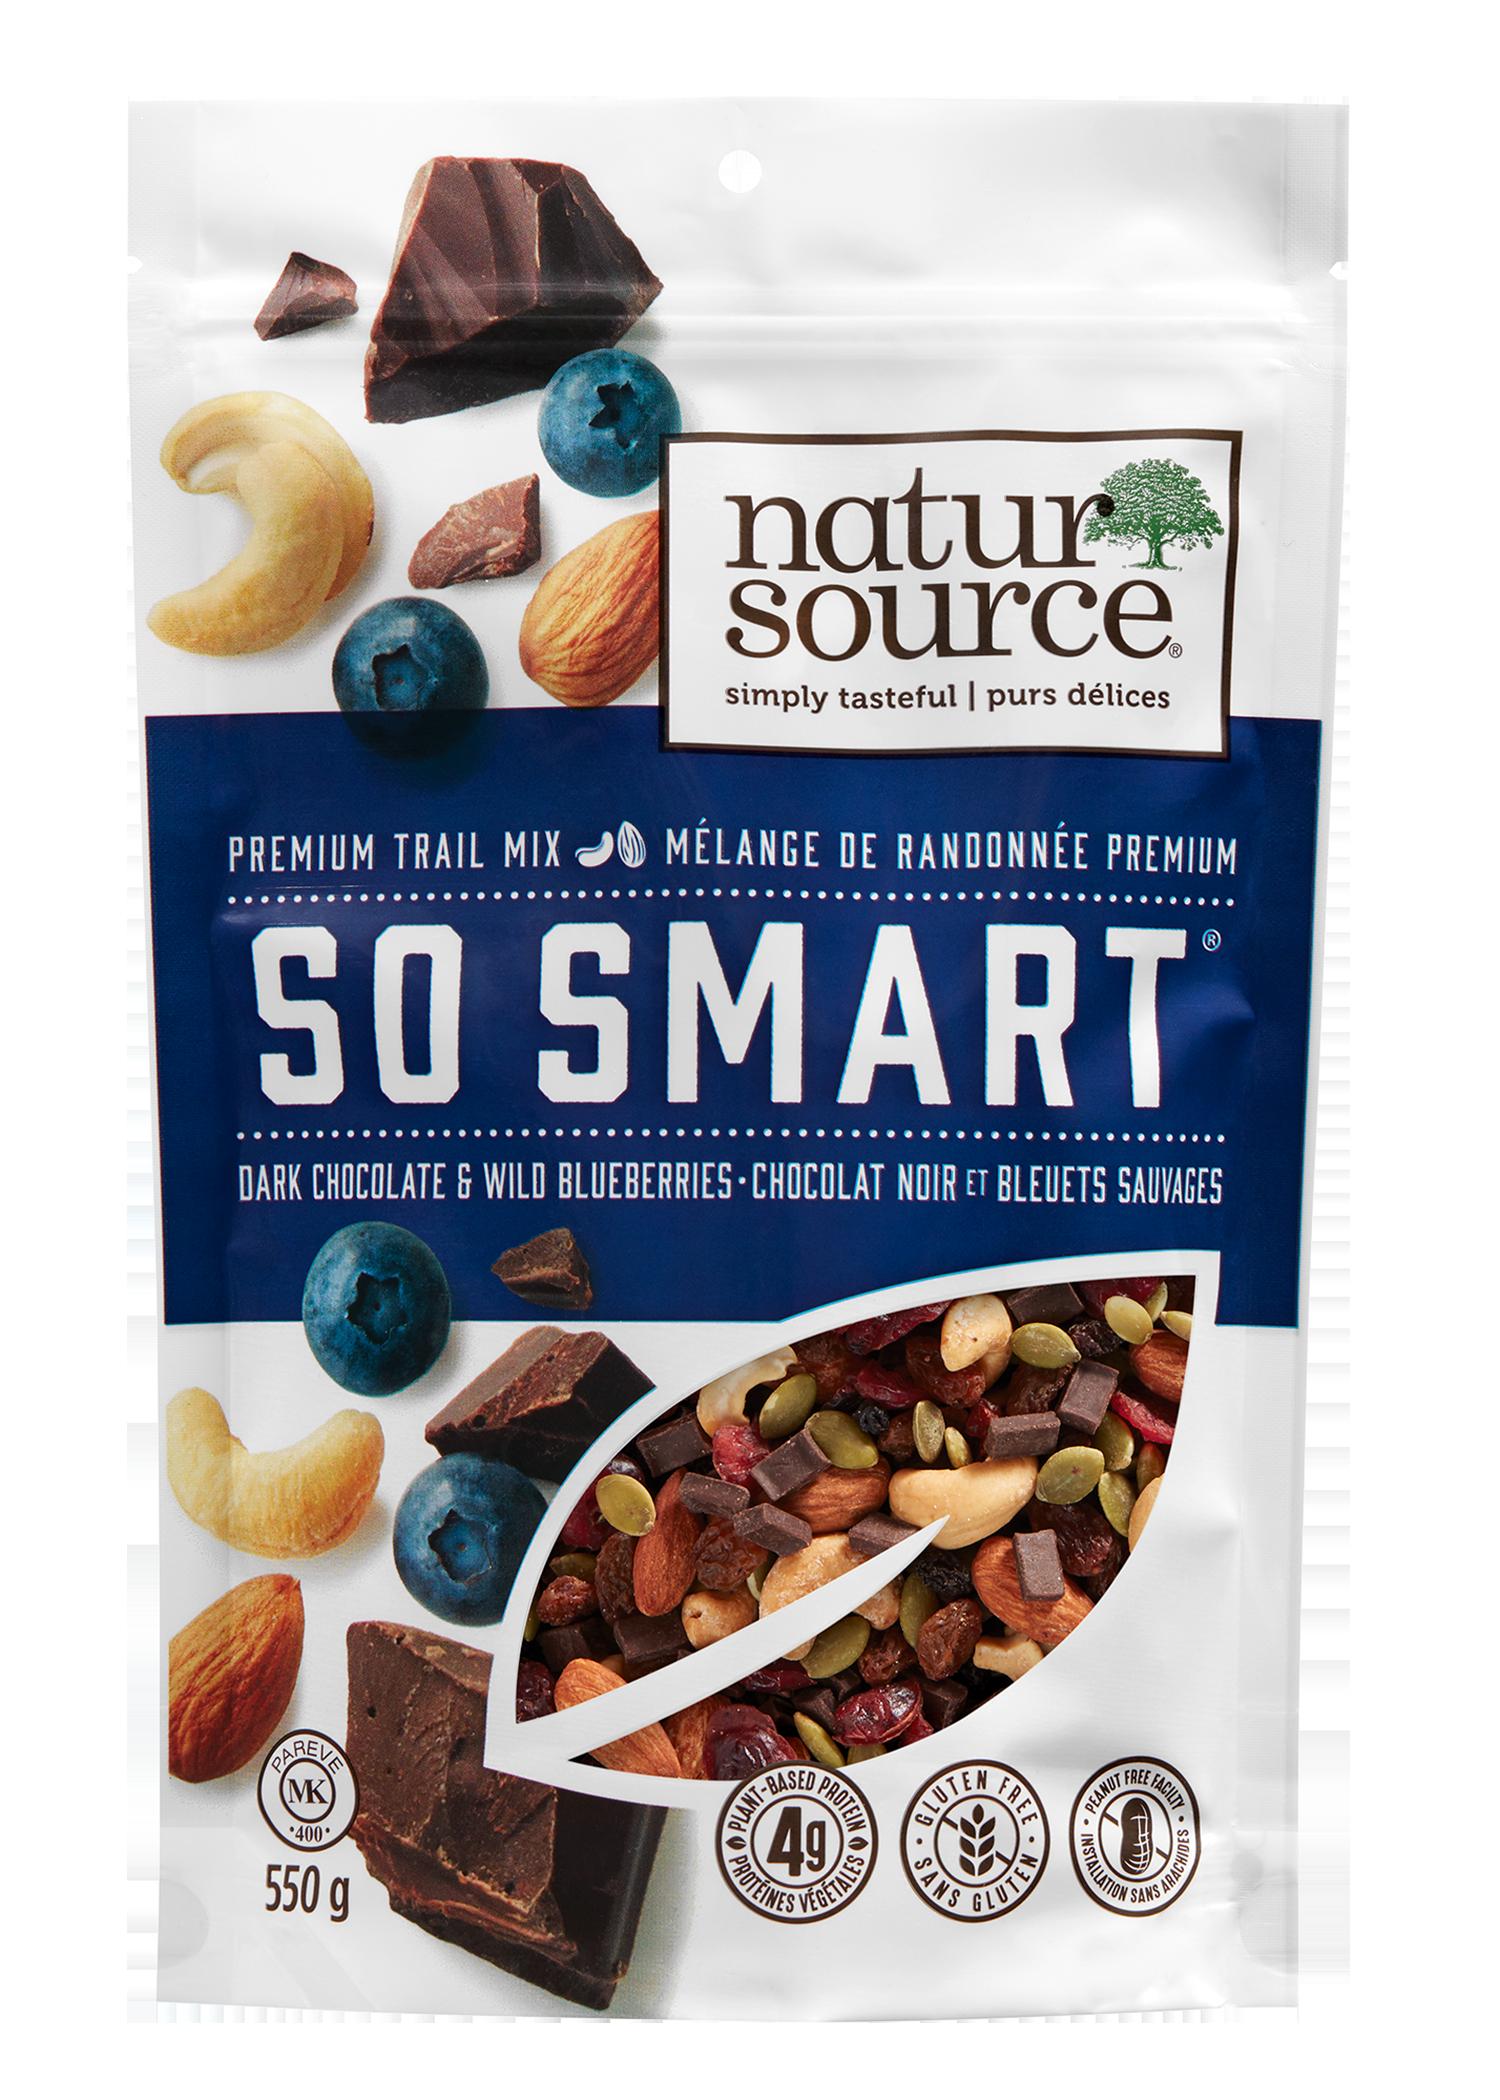 natursource So Smart® Premium trail mix with dark chocolate and wild blueberries